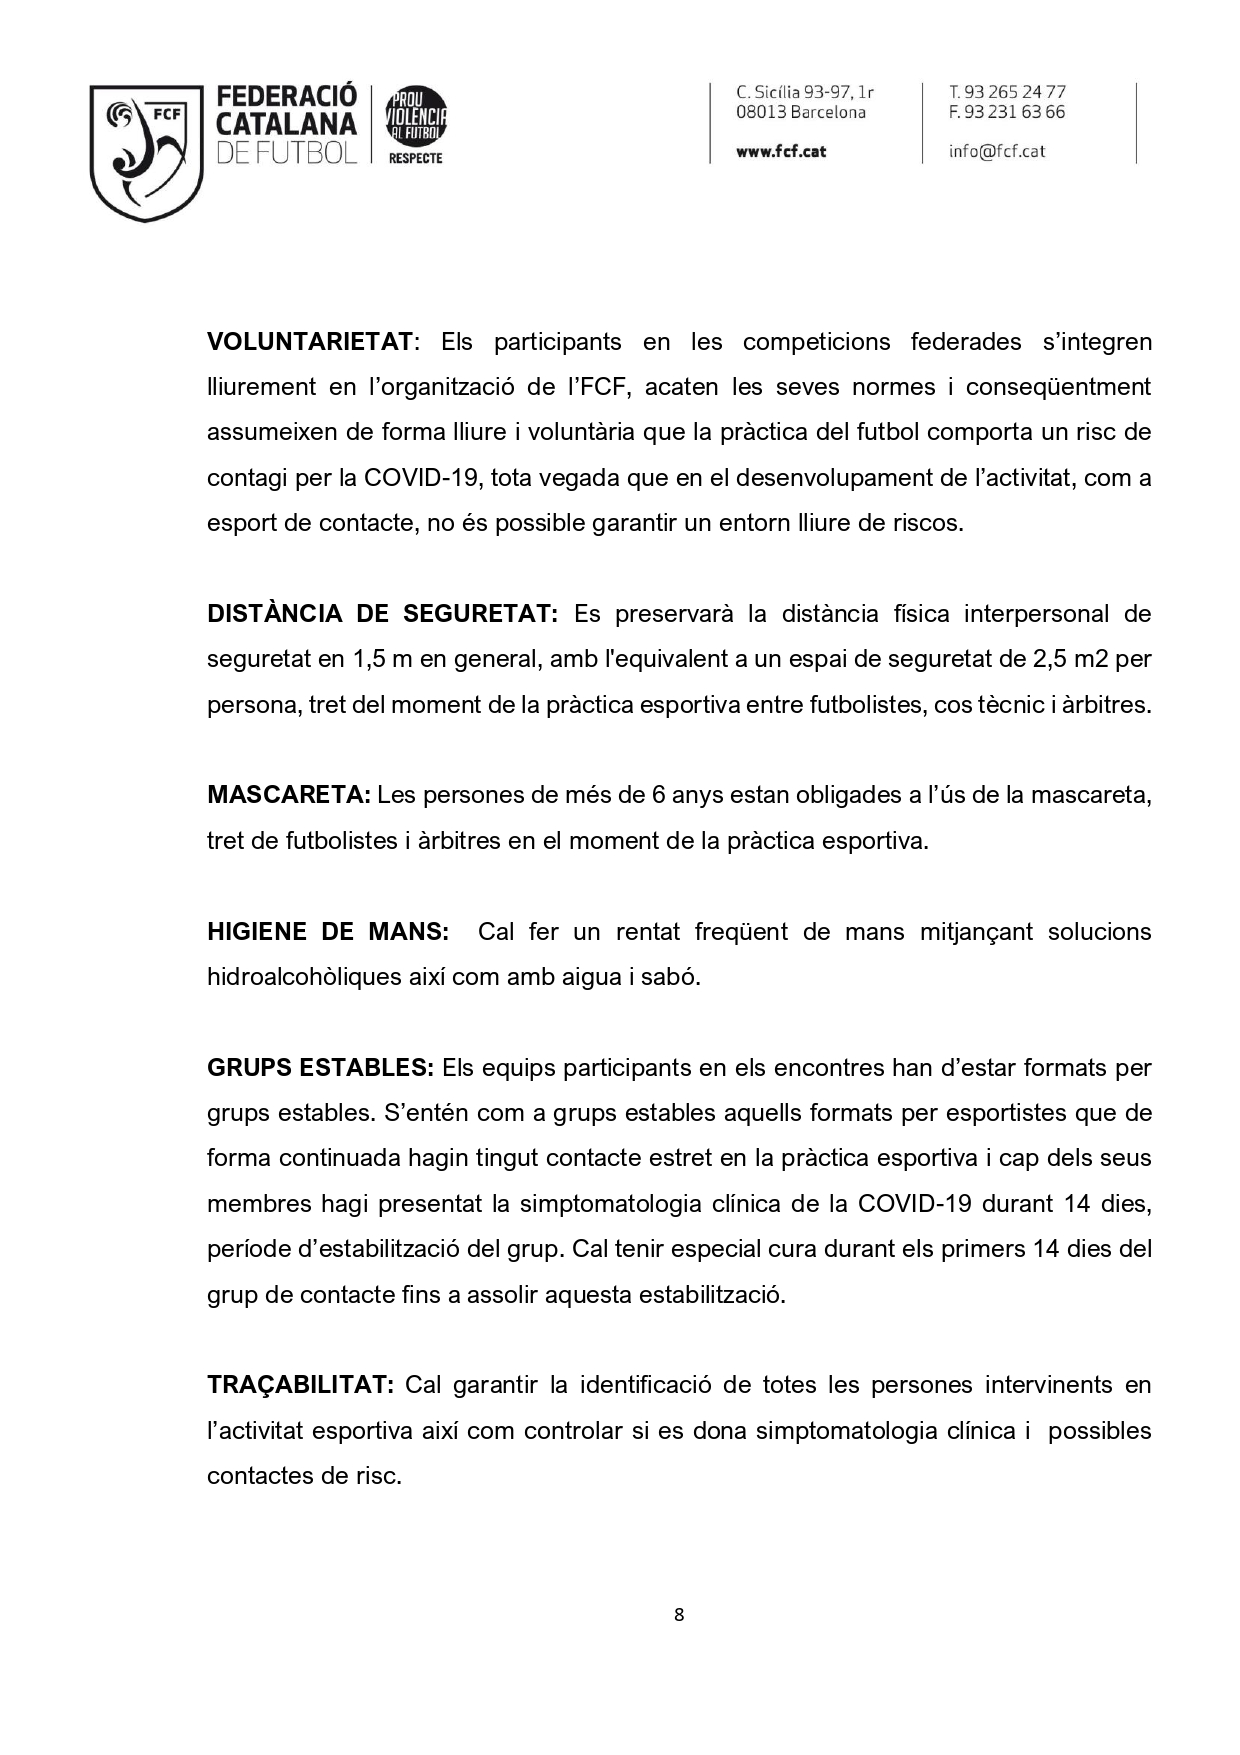 Circular Actualització Protocol Competicions _set21_2_page-0008